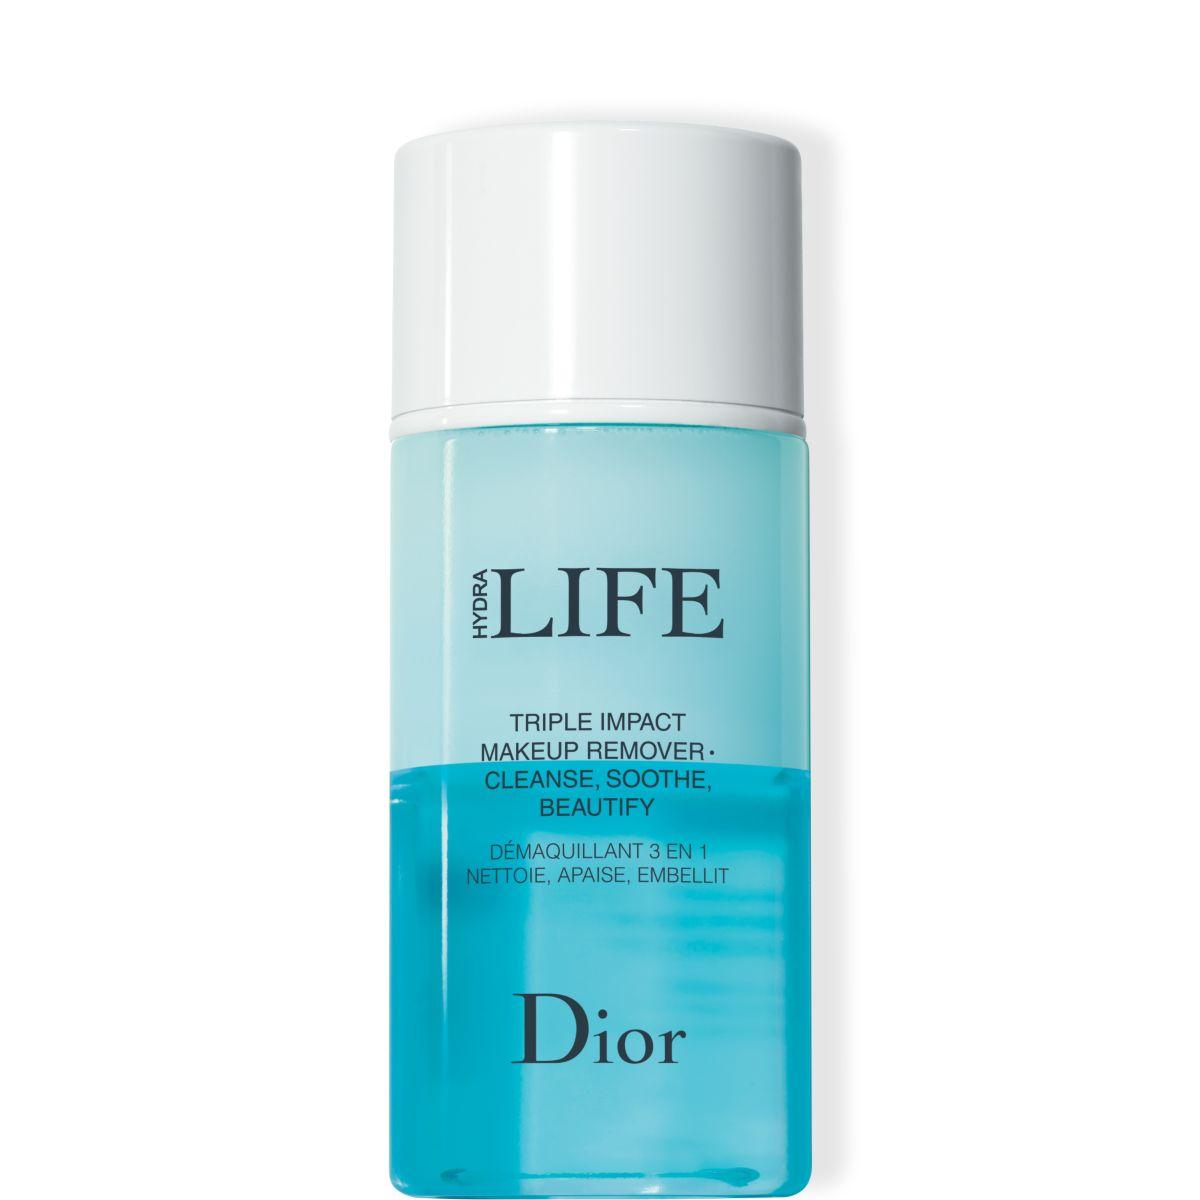 Dior - Dior Hydra Life - Démaquillant 3 en 1 Nettoie, Apaise, Embellit - 125 ml